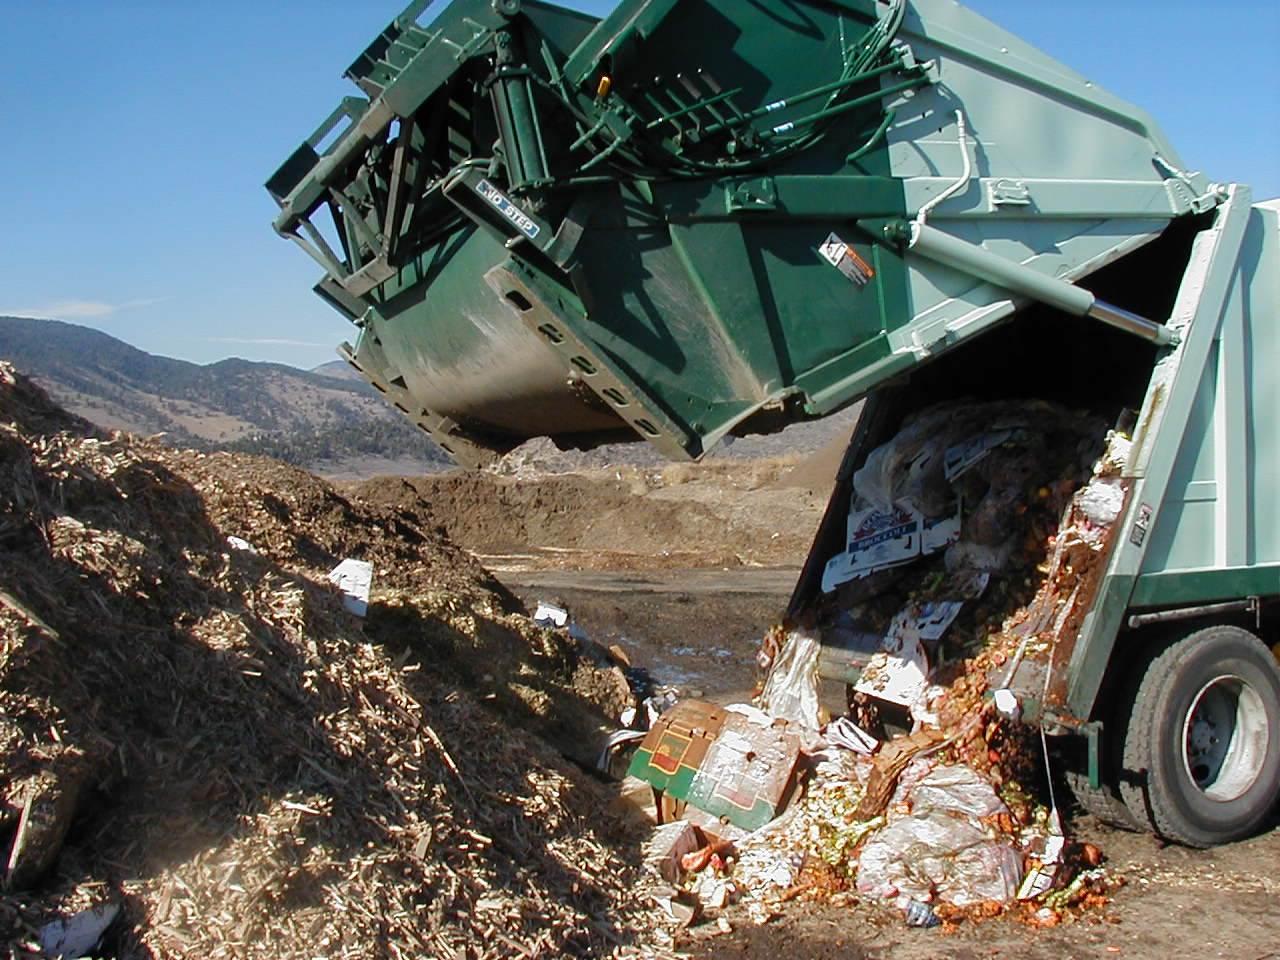 Composting & Carbon Farming